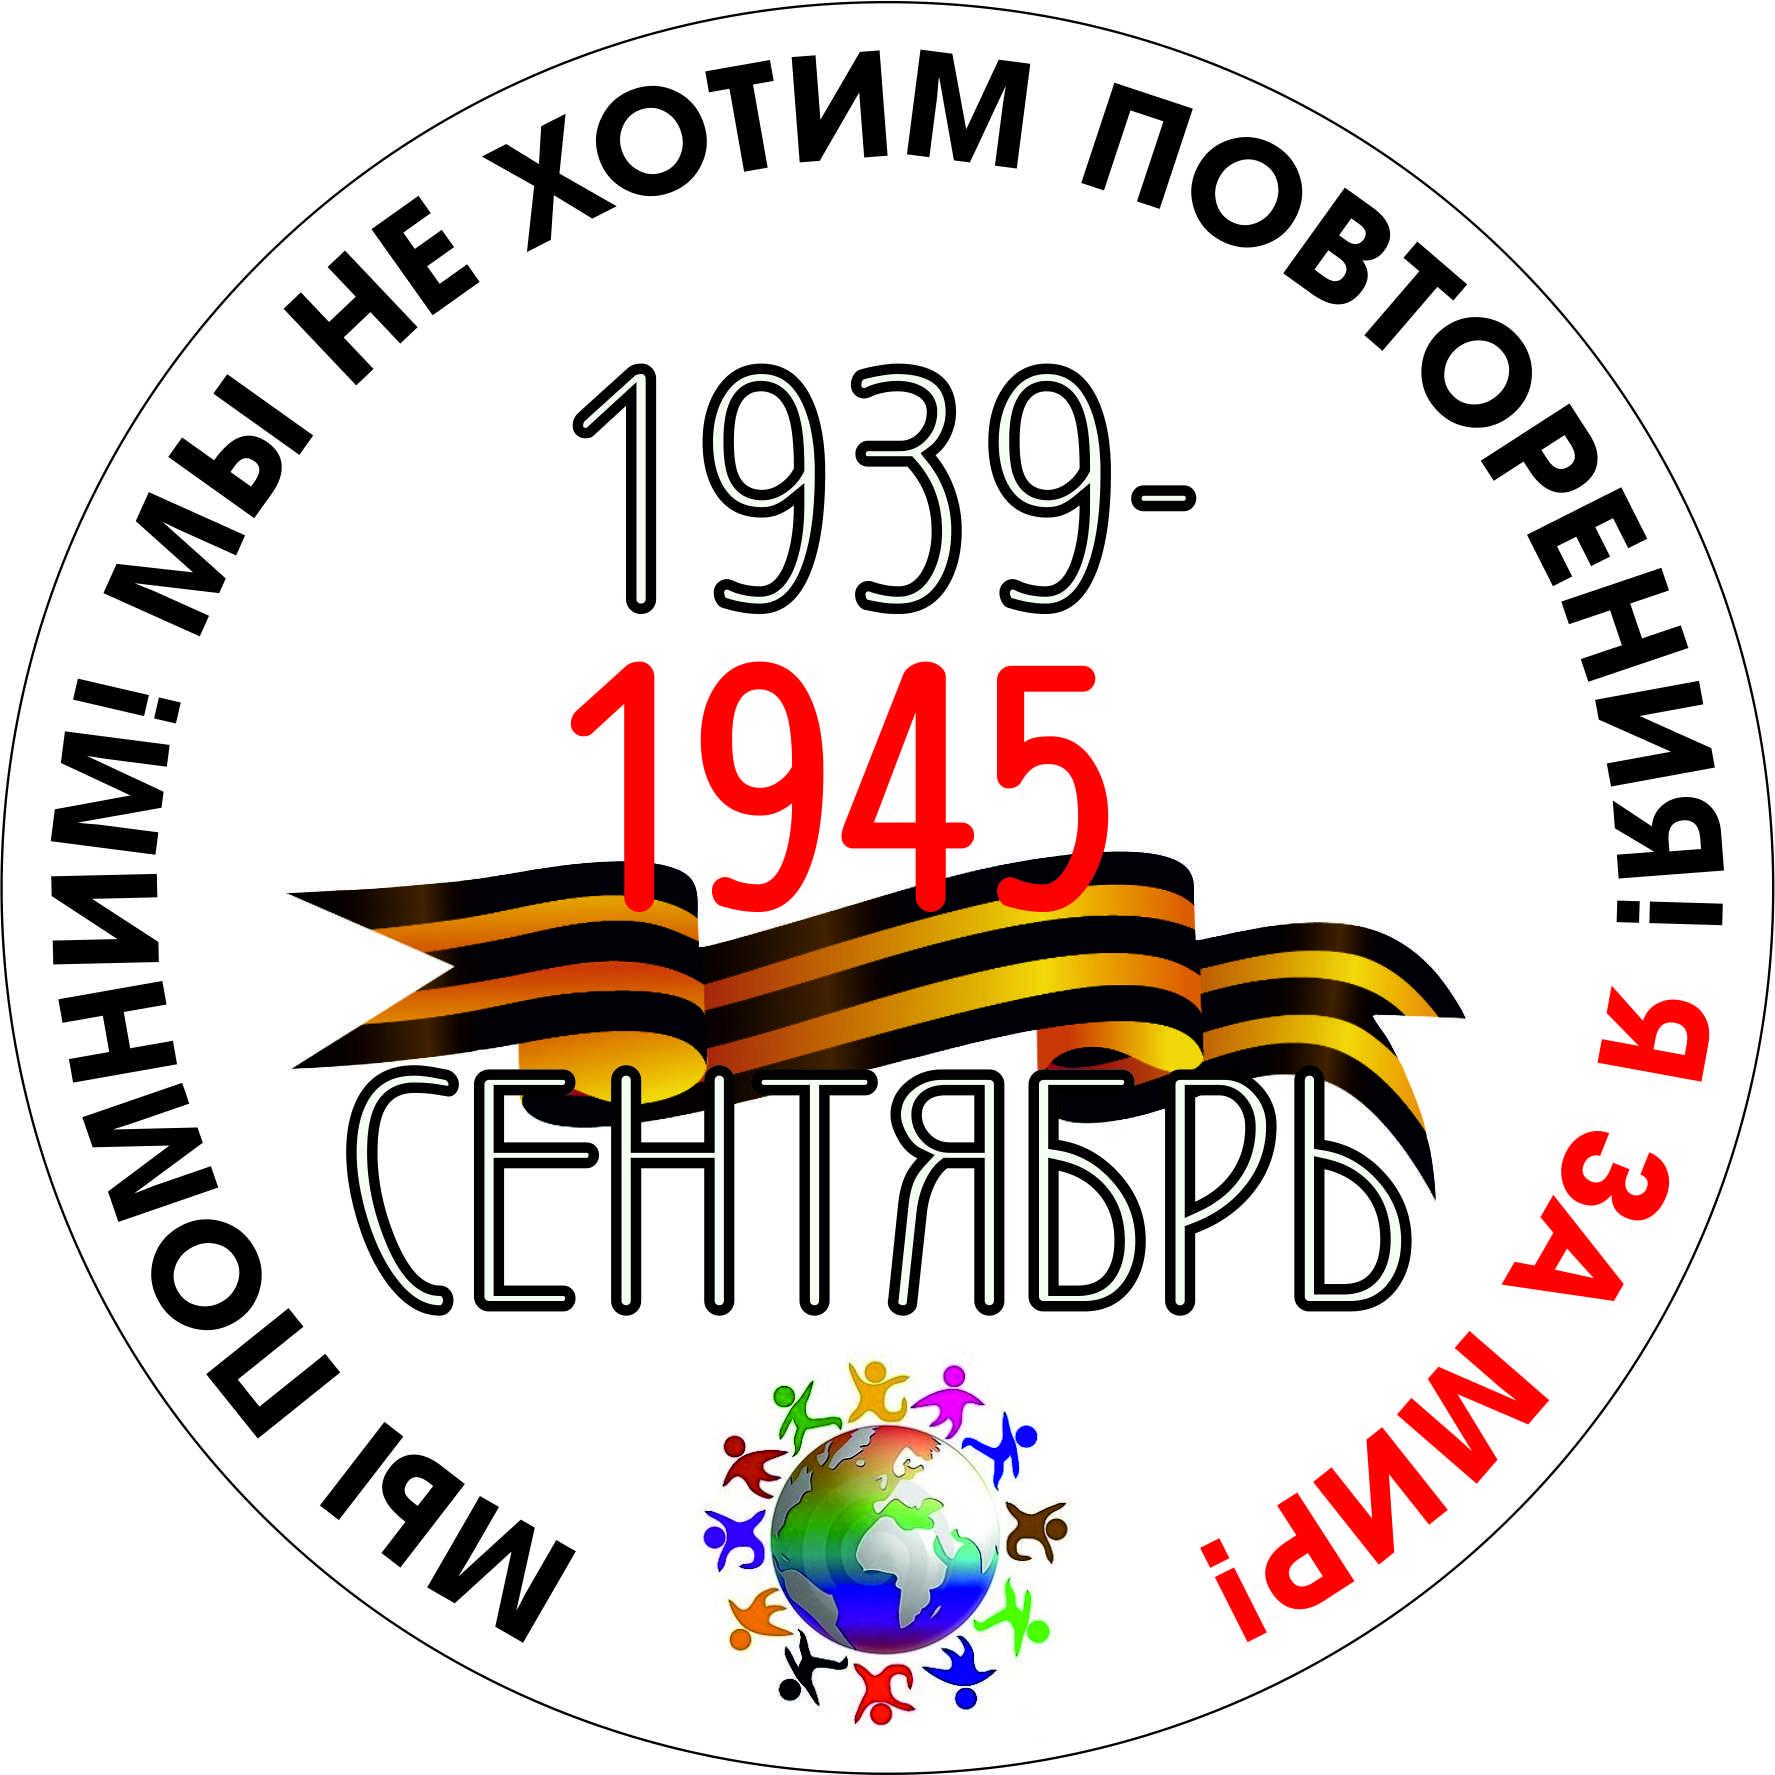 http://naklejki-na-avto.ru/images/upload/Мы%20помним...%20Я%20за%20Мир%2015%20на%2015%20230.jpg